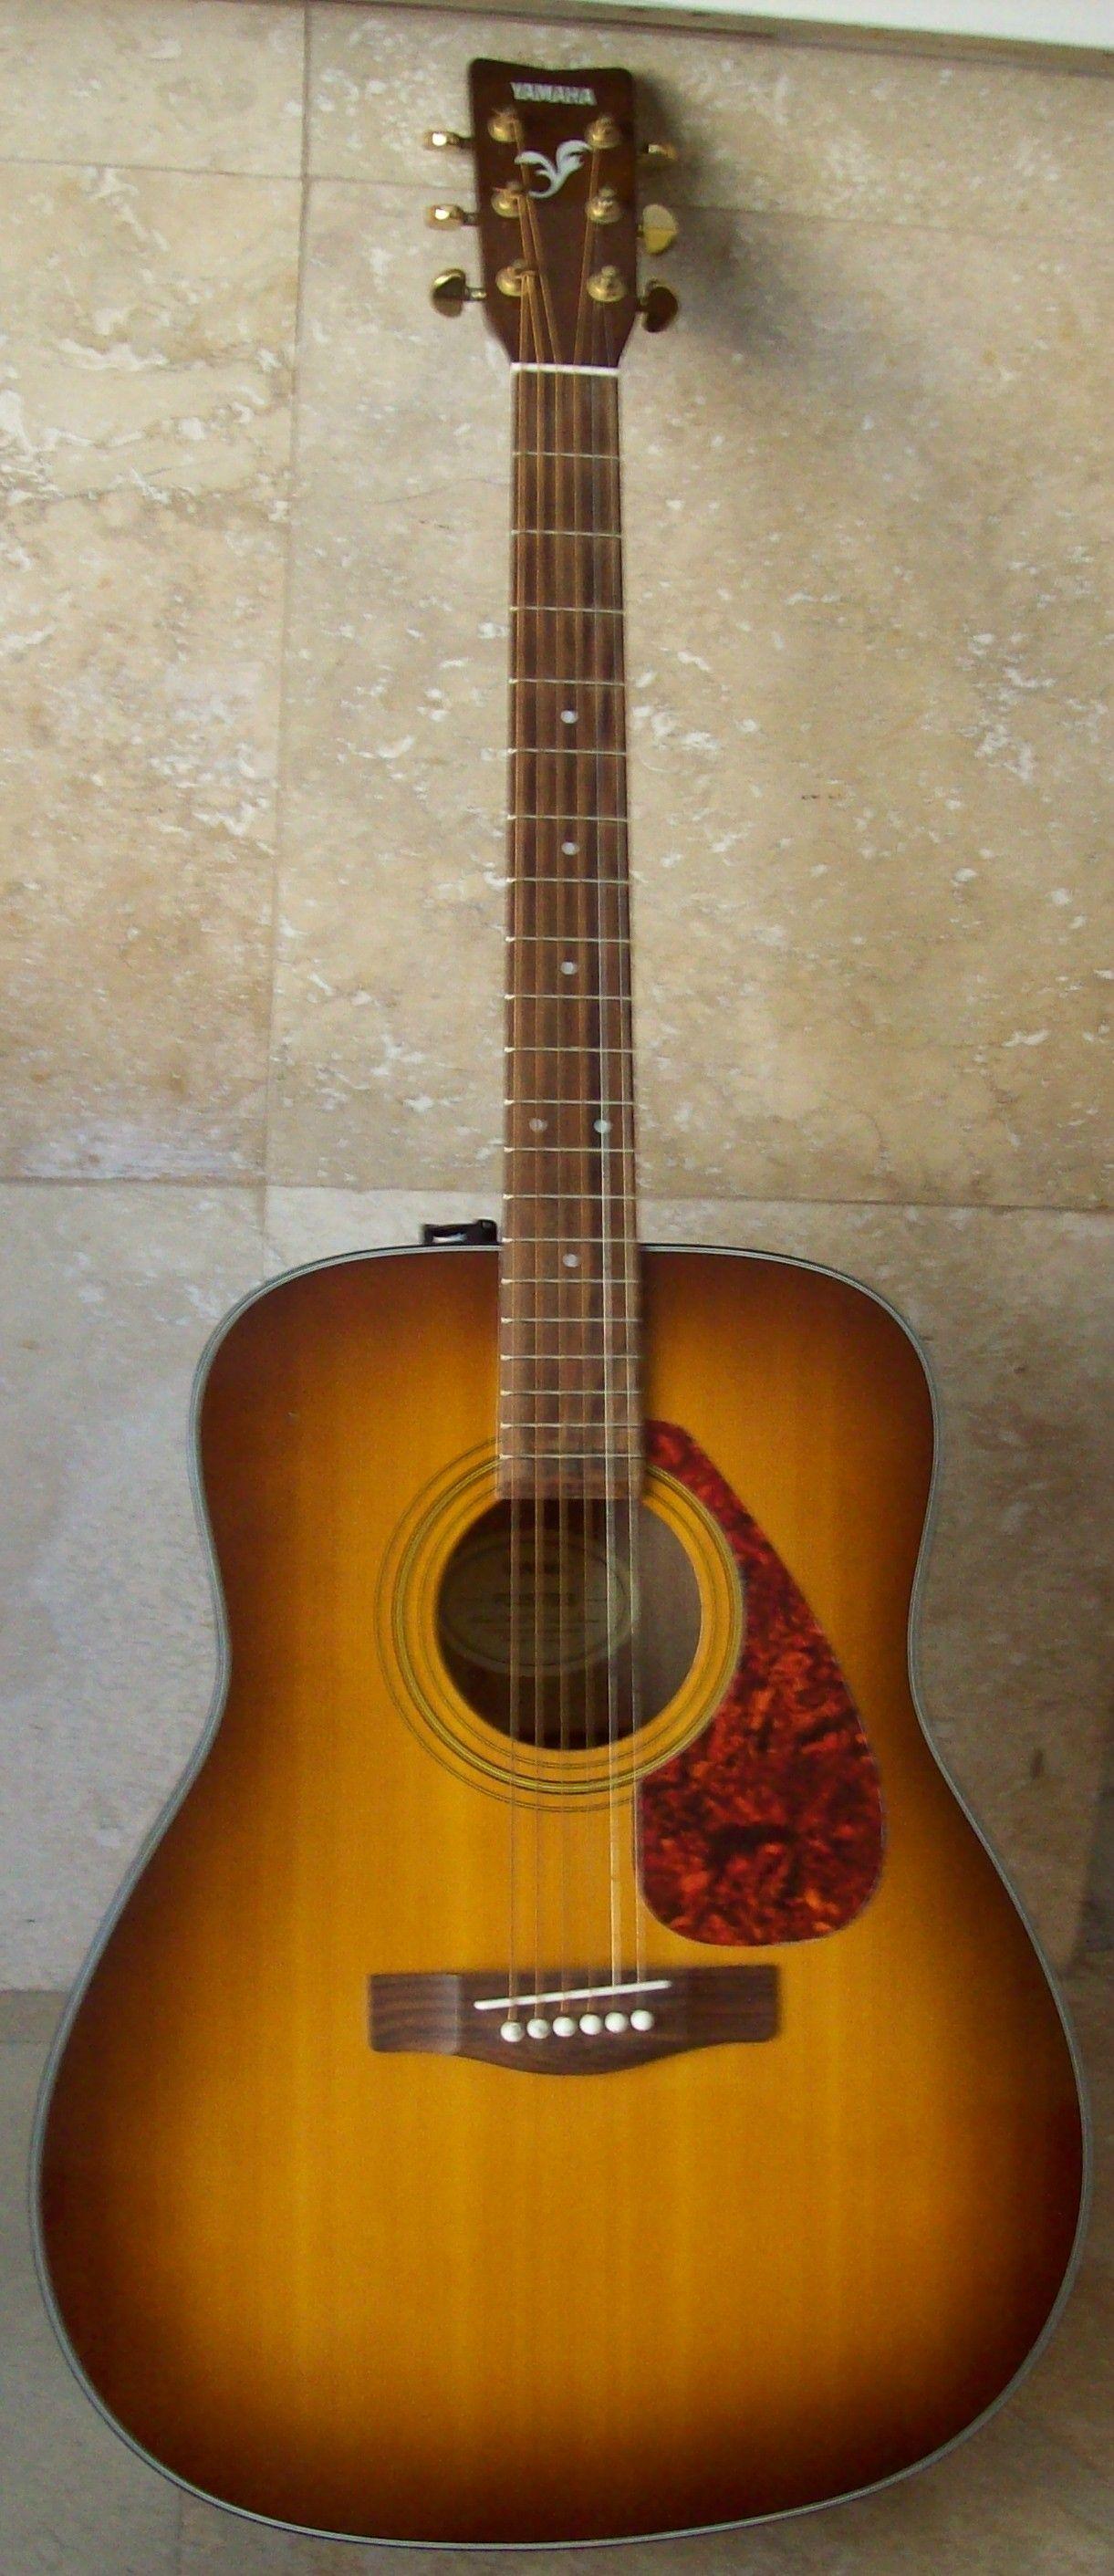 Vintage Yamaha F335 Tbs Tobacco Brown Sunburst Acoustic Guitar Guitar Acoustic Guitar Acoustic